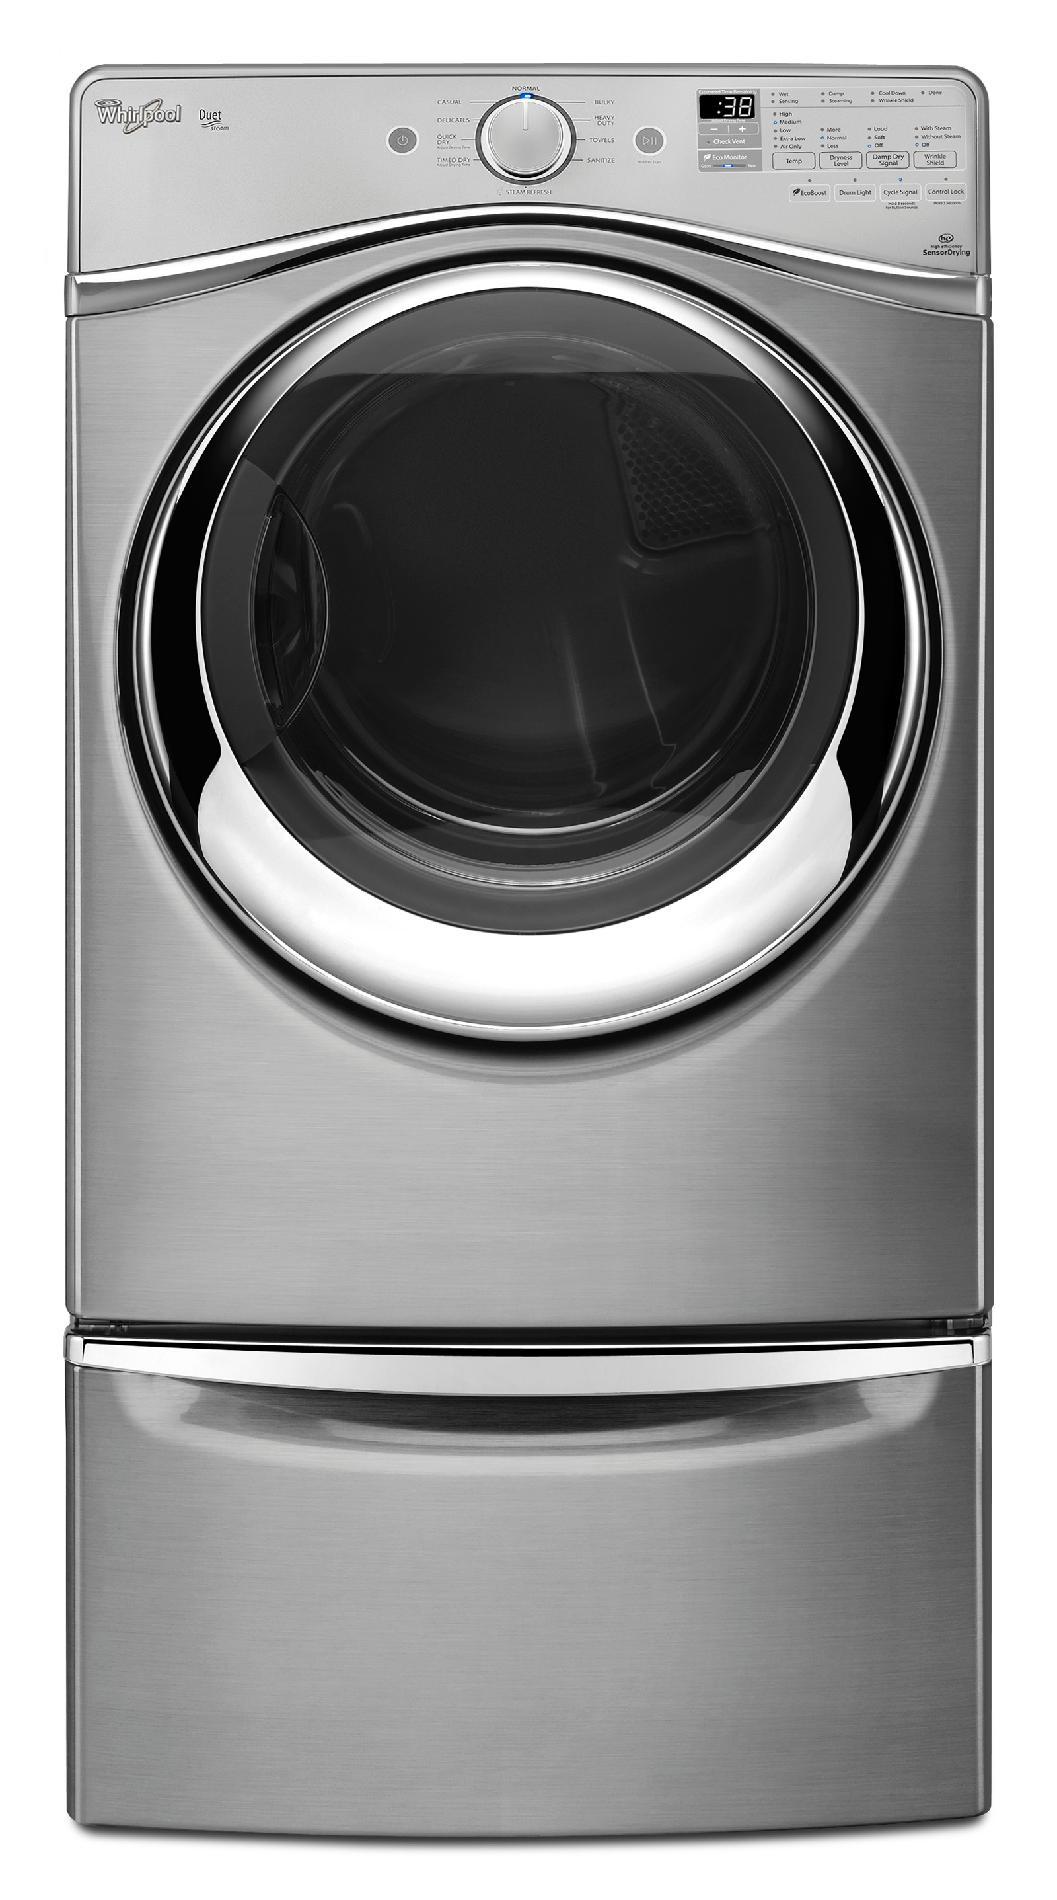 Whirlpool WGD95HEDU 7.4 cu. ft. Duet® Gas Dryer w/ Stainless Steel Drum - Diamond Steel